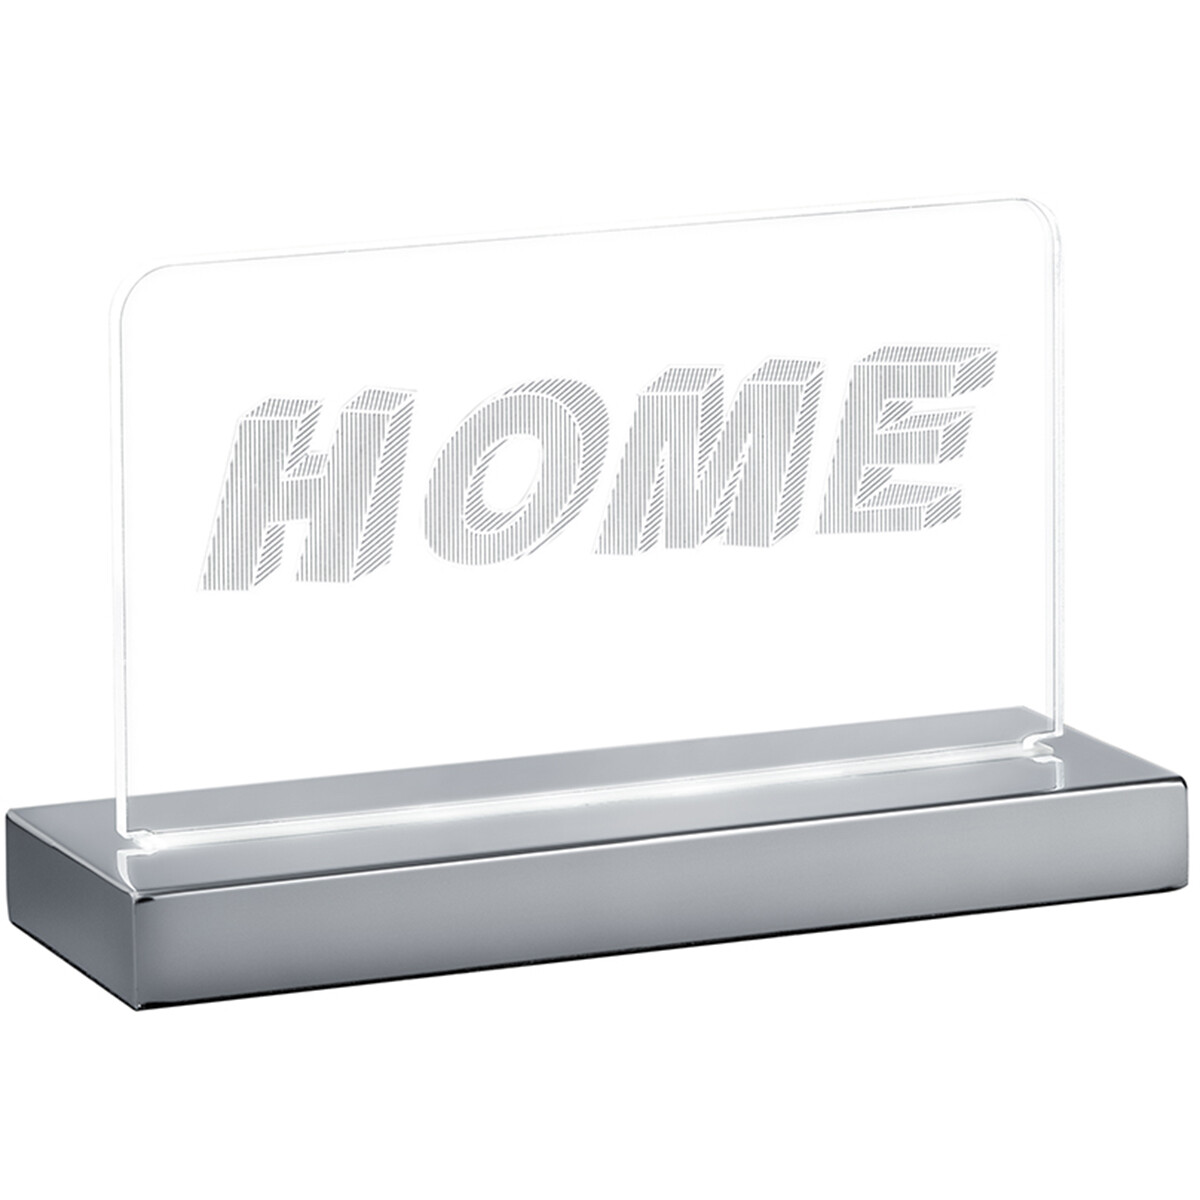 LED Hanglamp - Hangverlichting - Trion Hamilton - 7W - Aanpasbare Kleur - Rechthoek - Mat Chroom - Aluminium